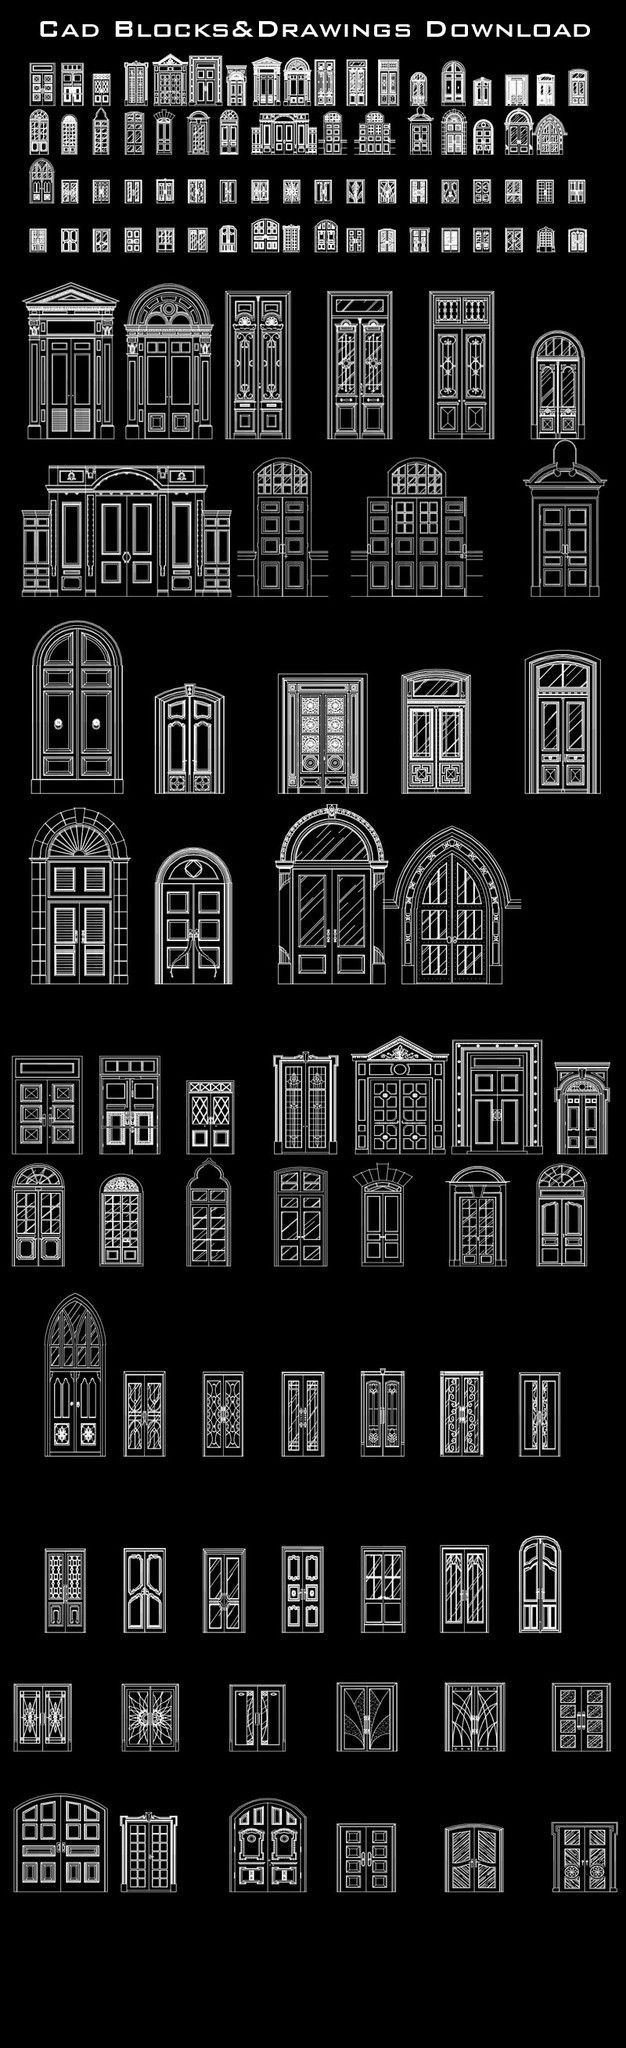 Best door design ideas u cad design free cad blocksdrawings